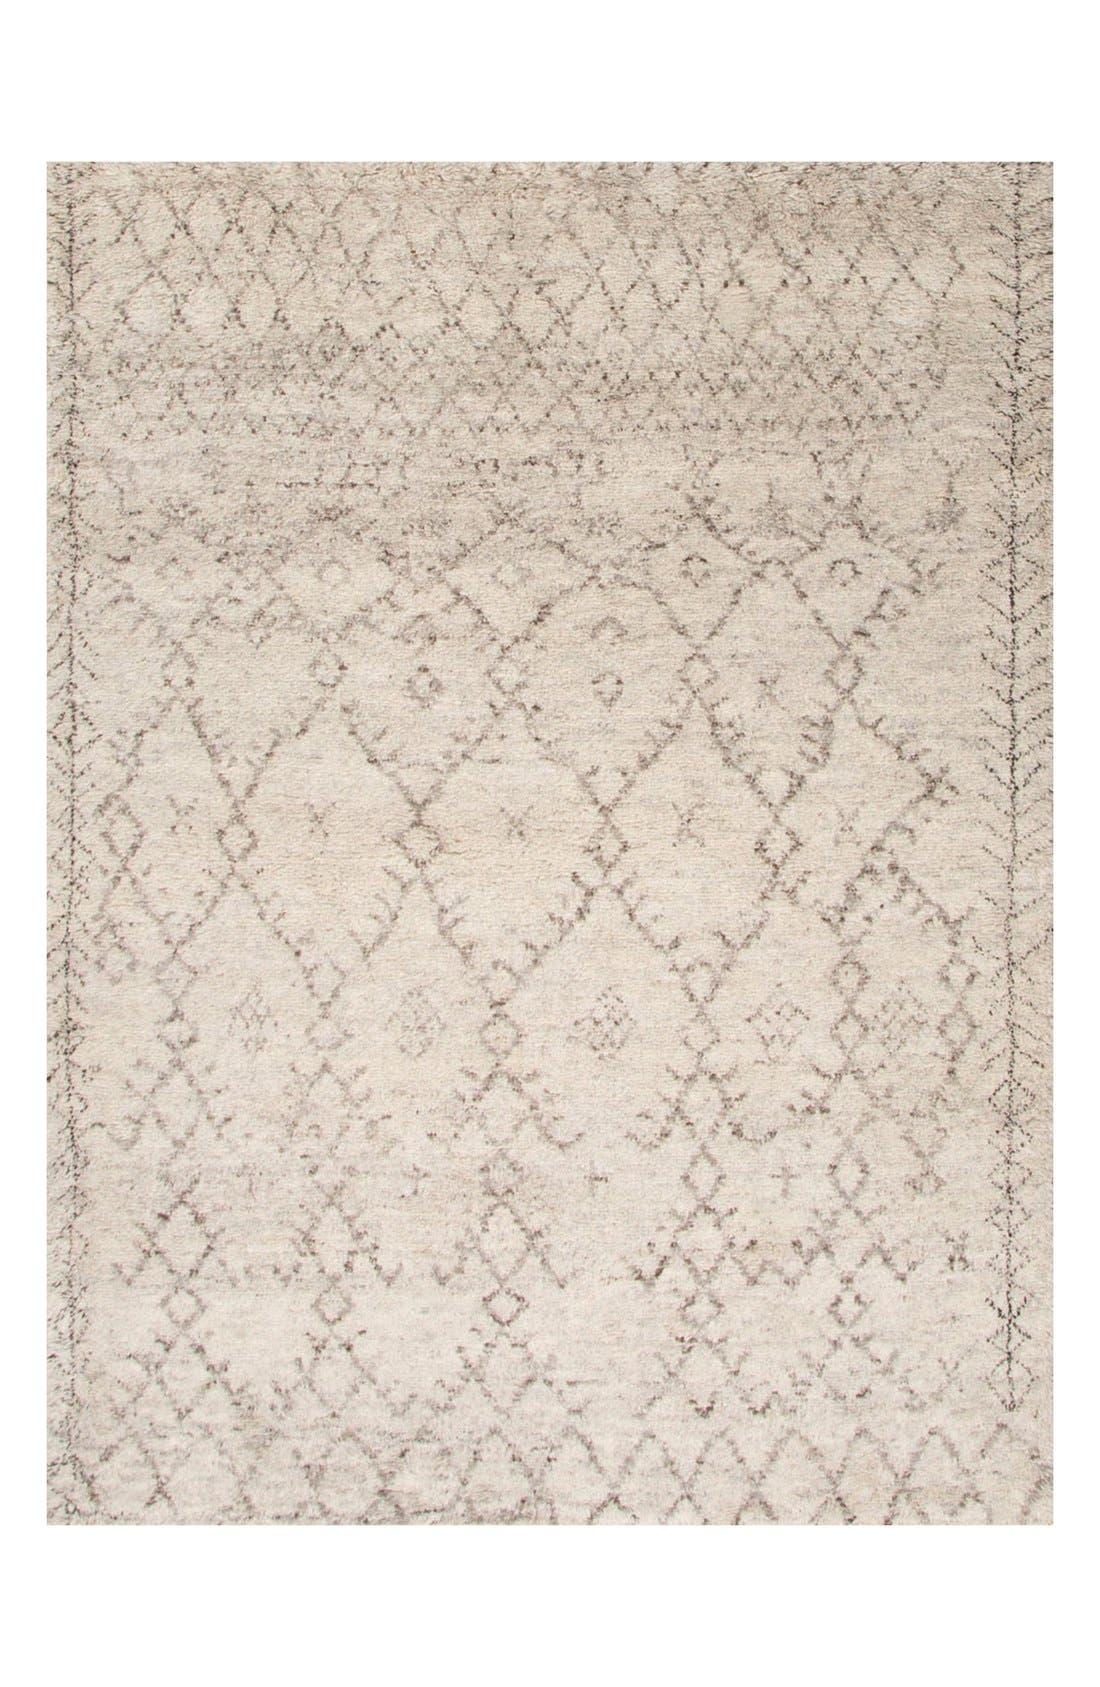 'Zola' Wool Area Rug,                             Main thumbnail 1, color,                             IVORY/ GREY